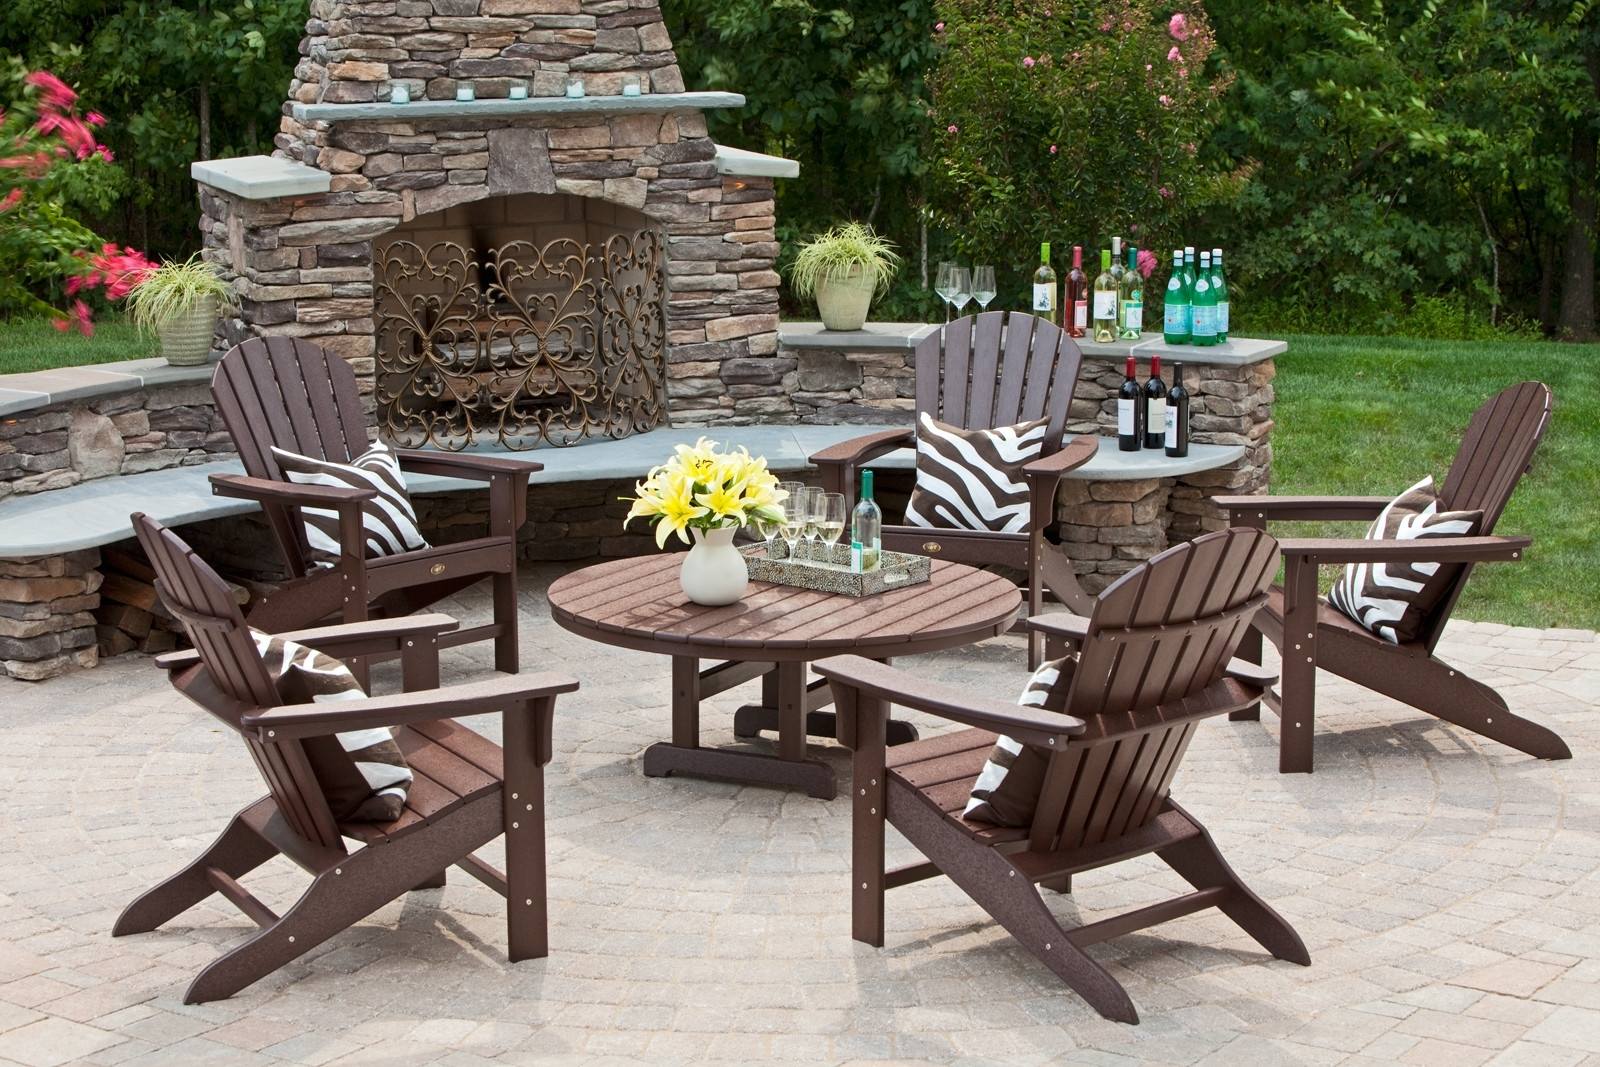 2018 Patio Conversation Sets Costco Best Patio Furniture Under $500 4 Within Patio Conversation Sets Under $ (View 4 of 15)